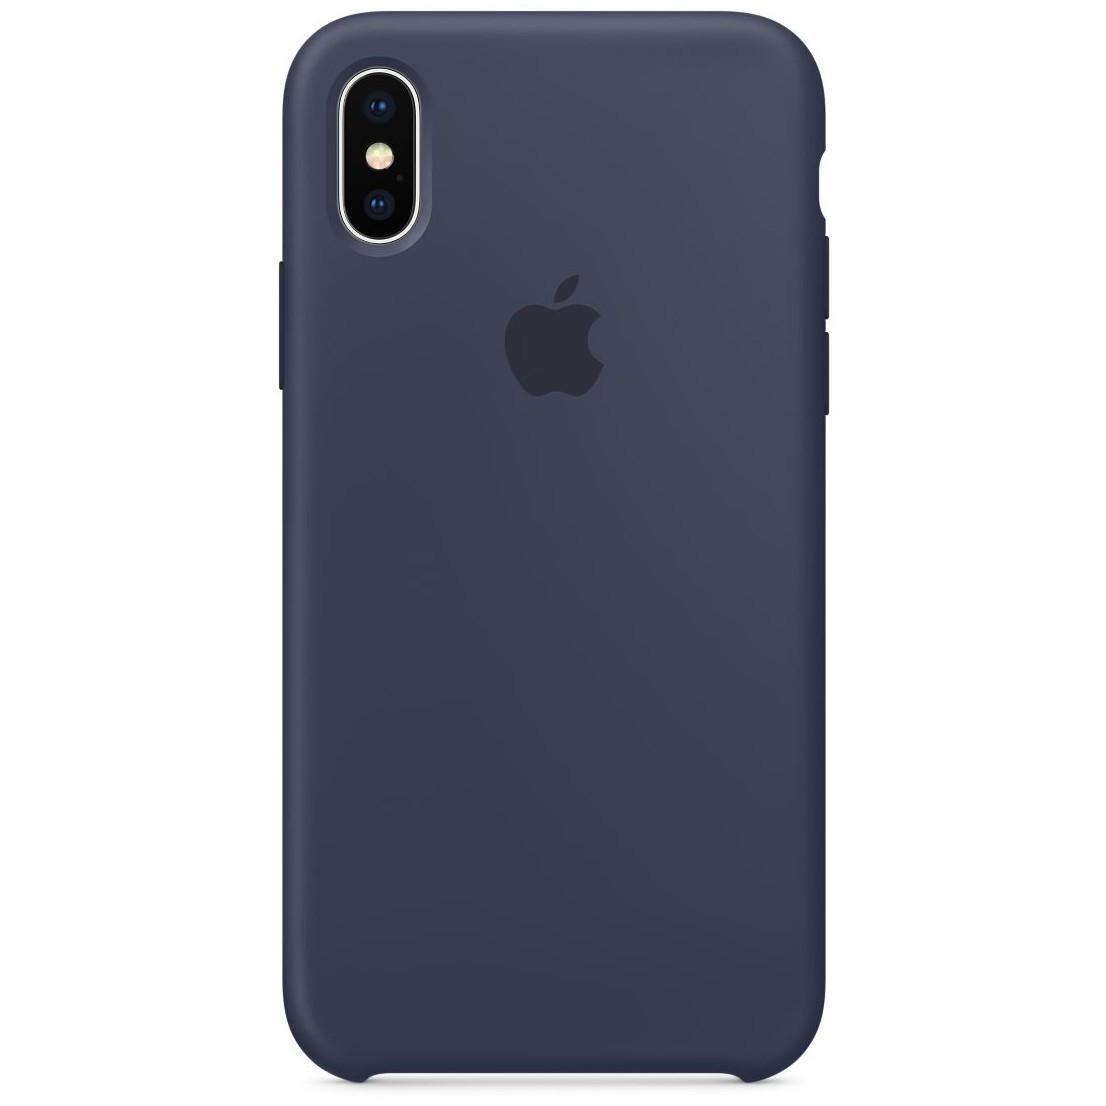 Чехол накладка xCase для iPhone XS Max Silicone Case темно-синий